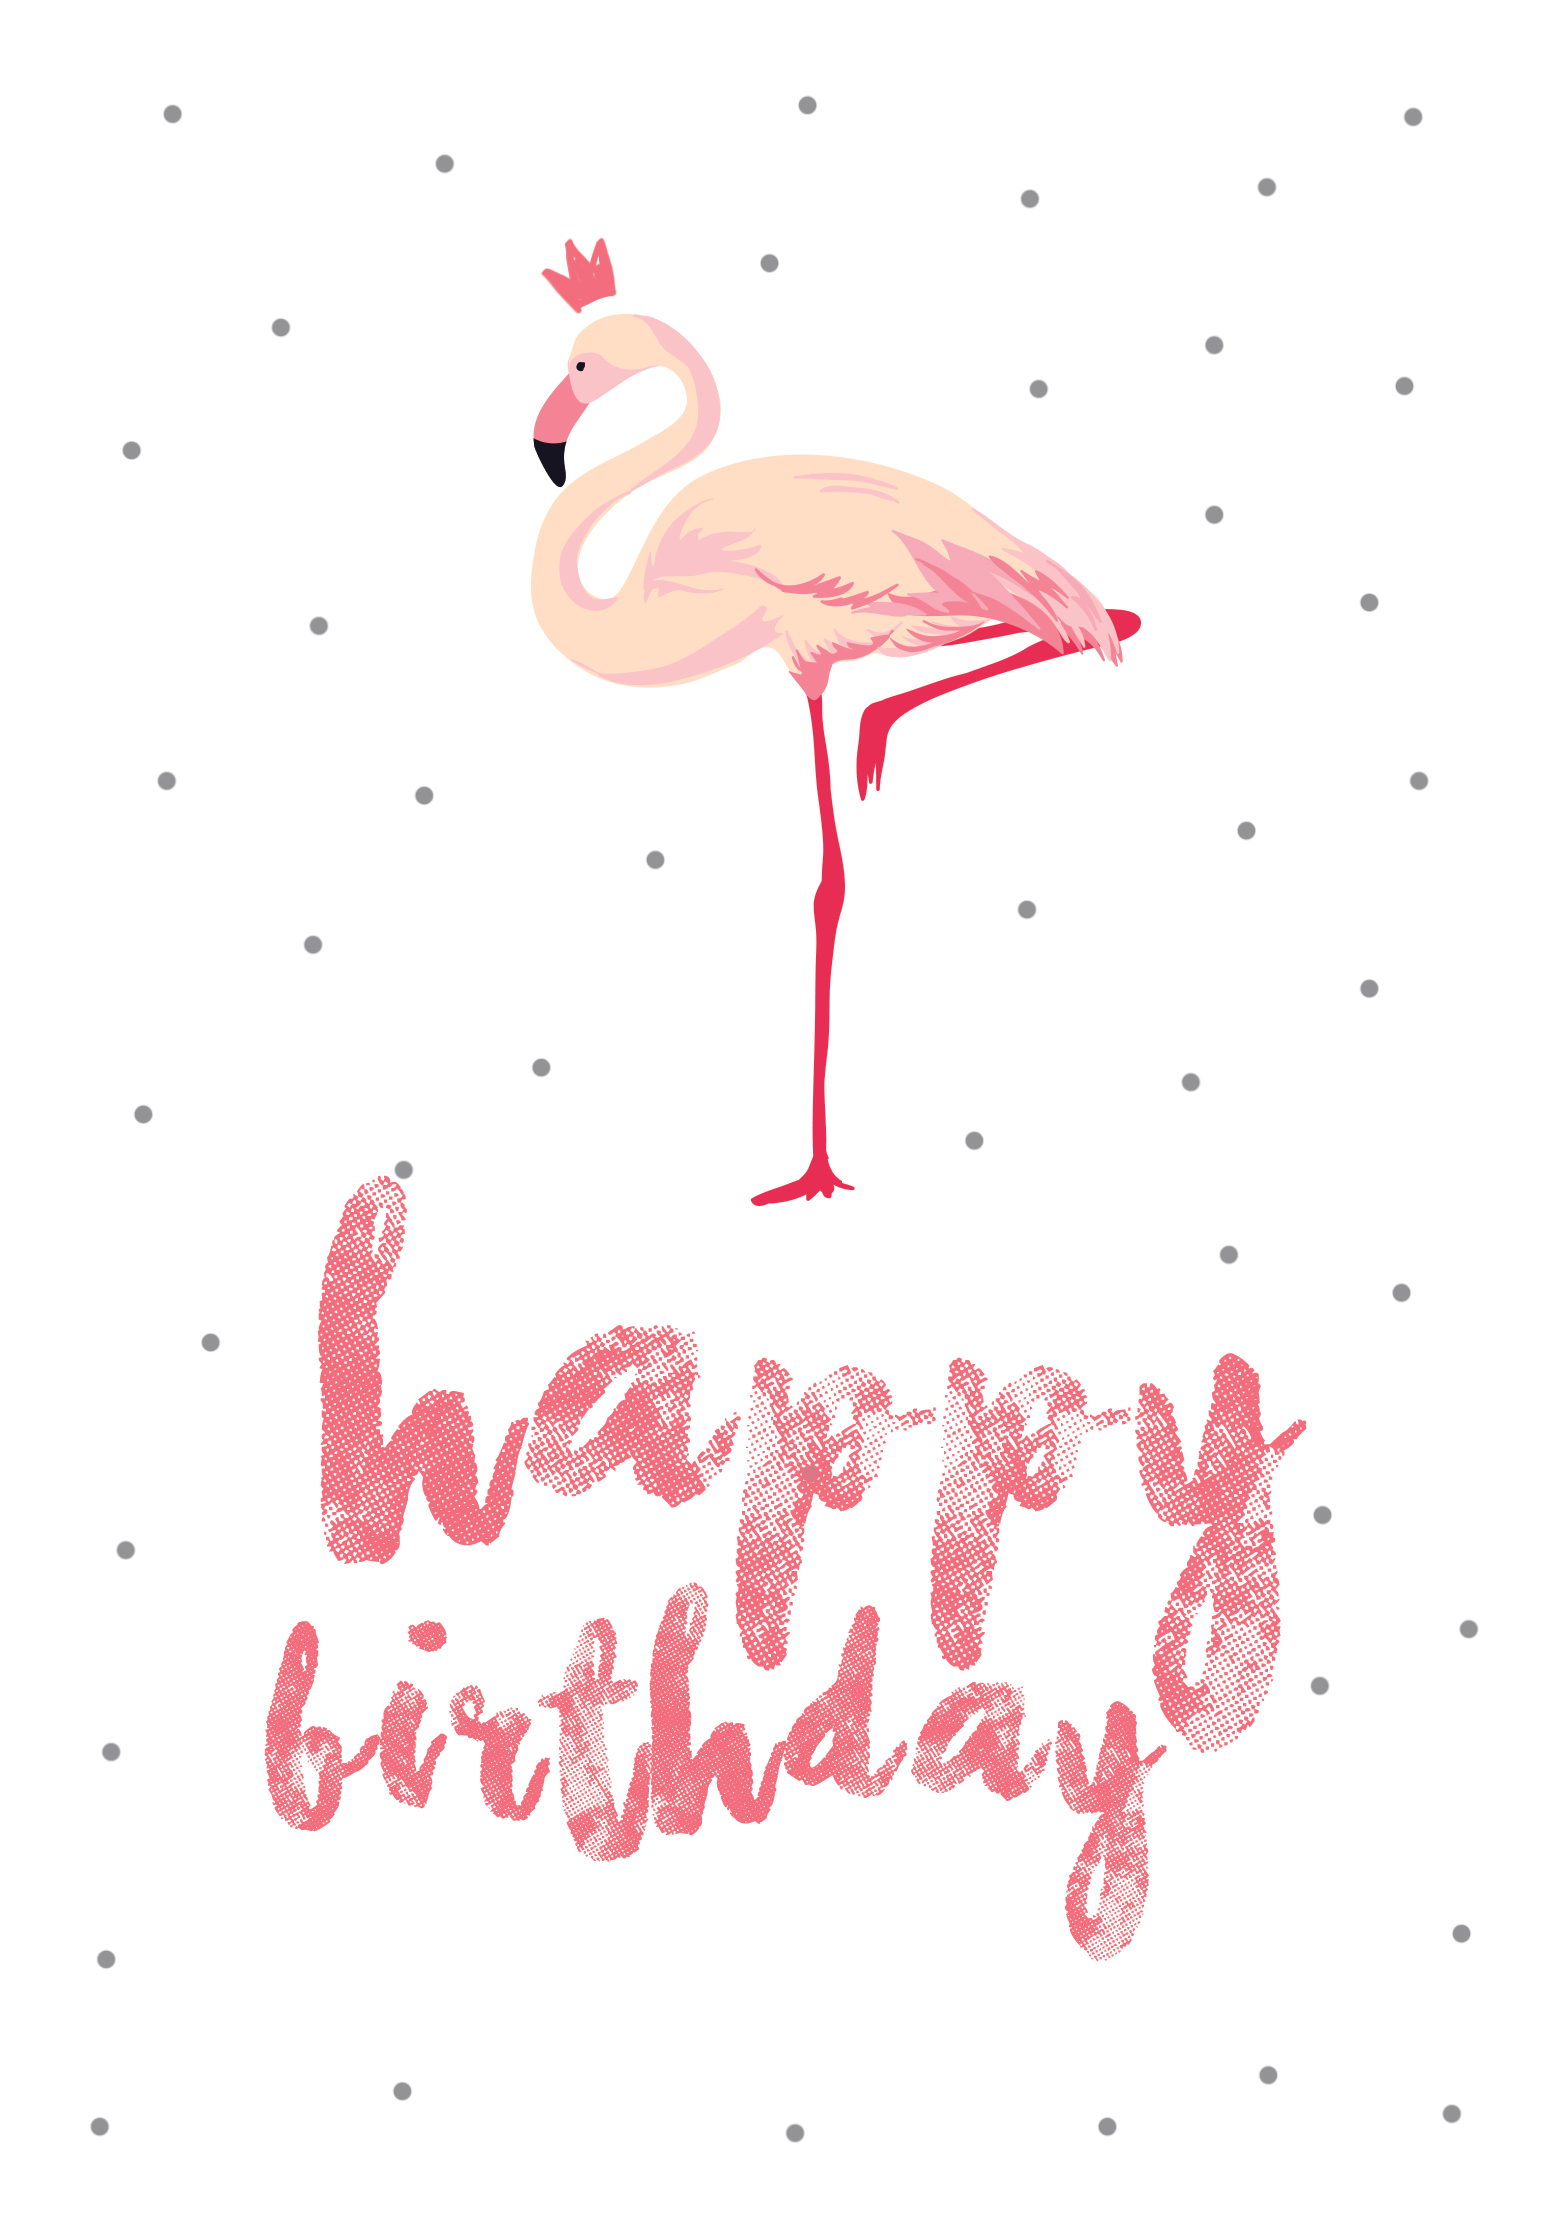 Flamingo Birthday - Free Printable Birthday Card | Greetings Island - Free Printable Birthday Cards For Her